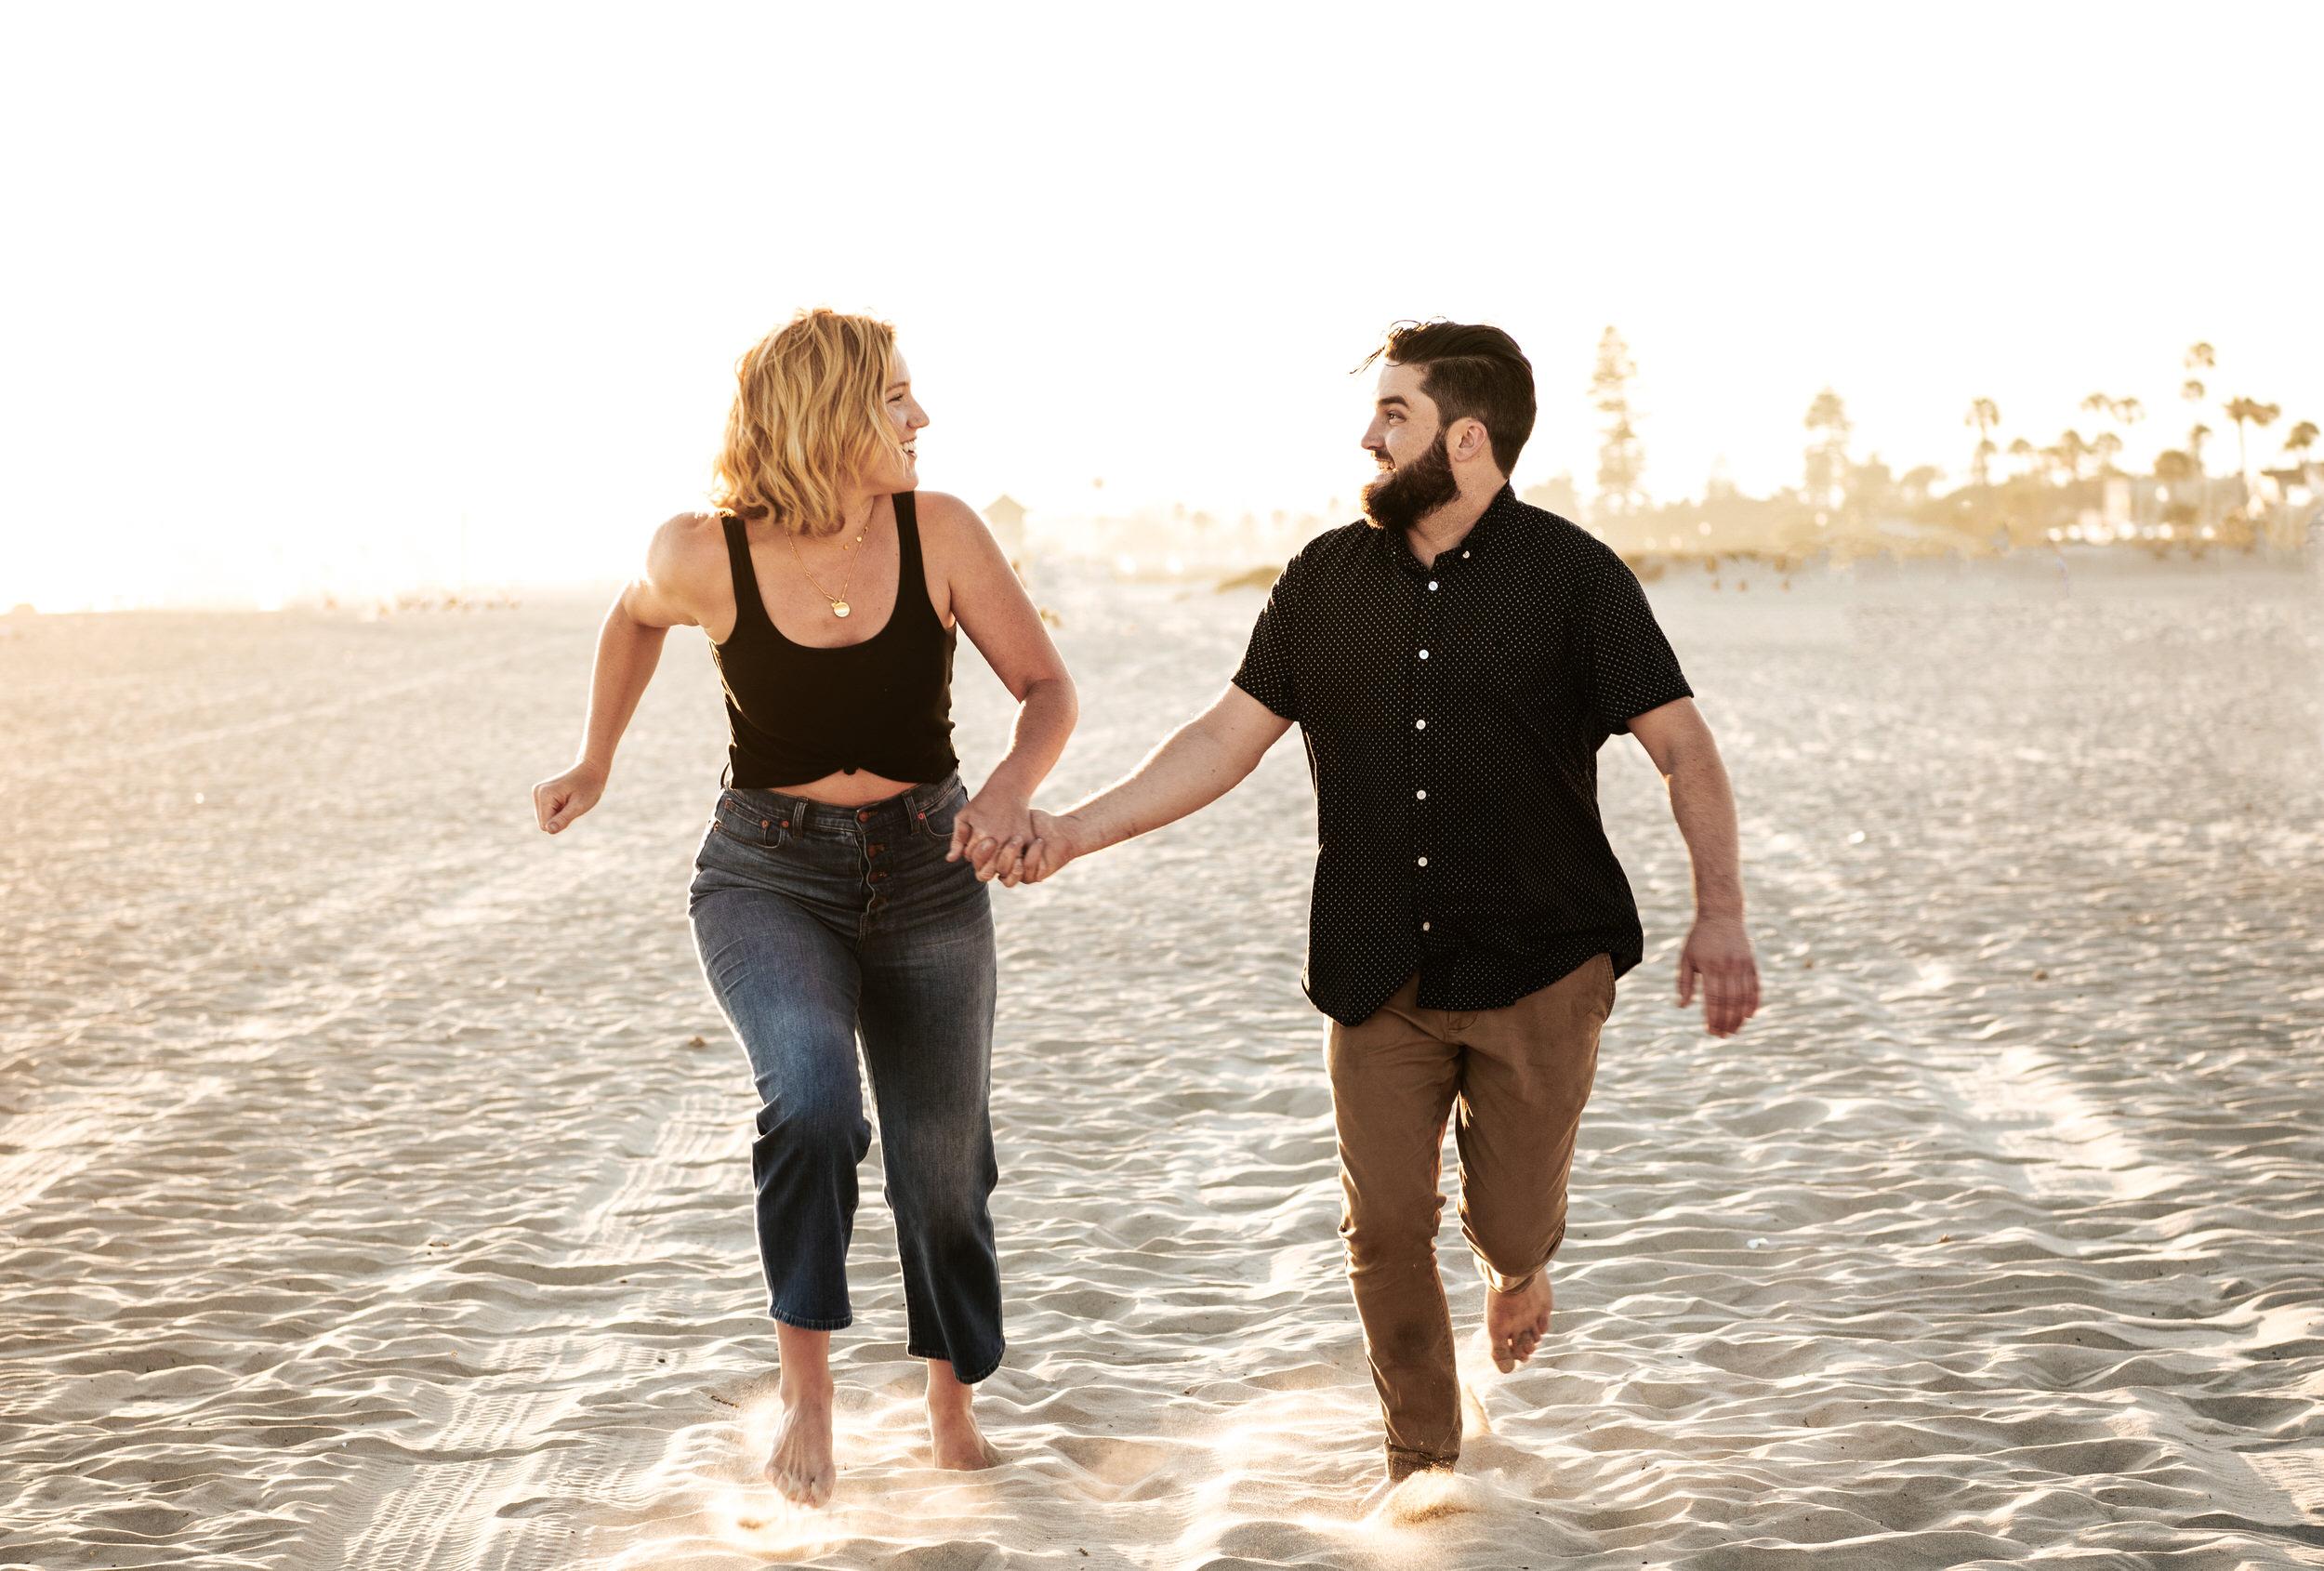 San Diego Engagement Photographer - Hotel Del Coronado - Coronado beach bonfire engagement session